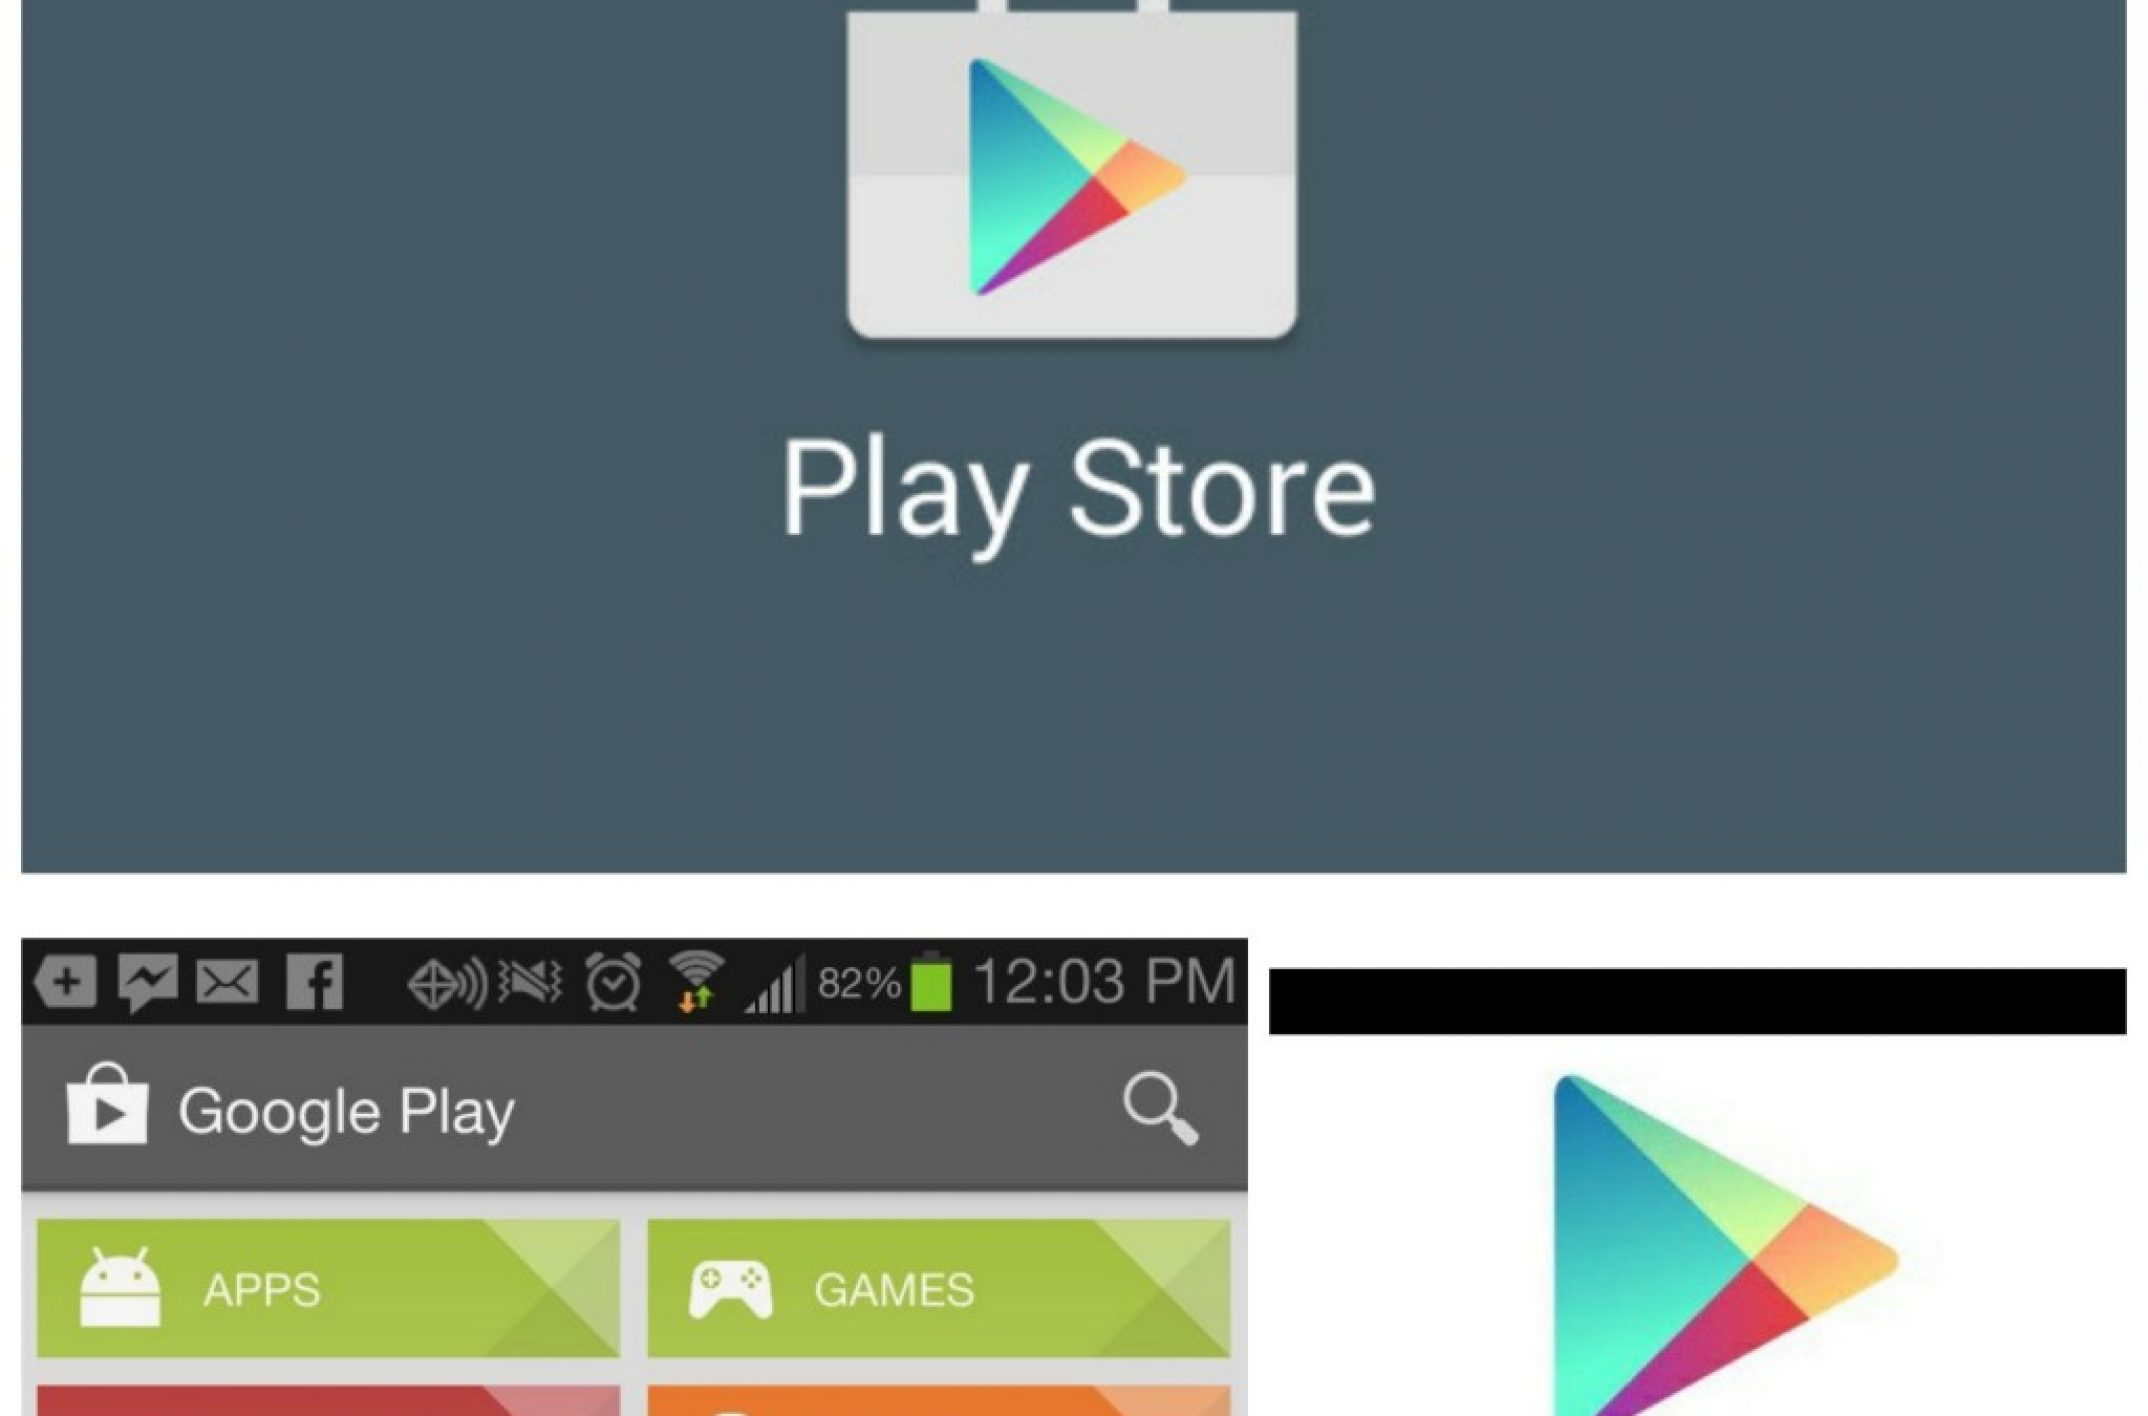 Comment installer play store gratuitement ?